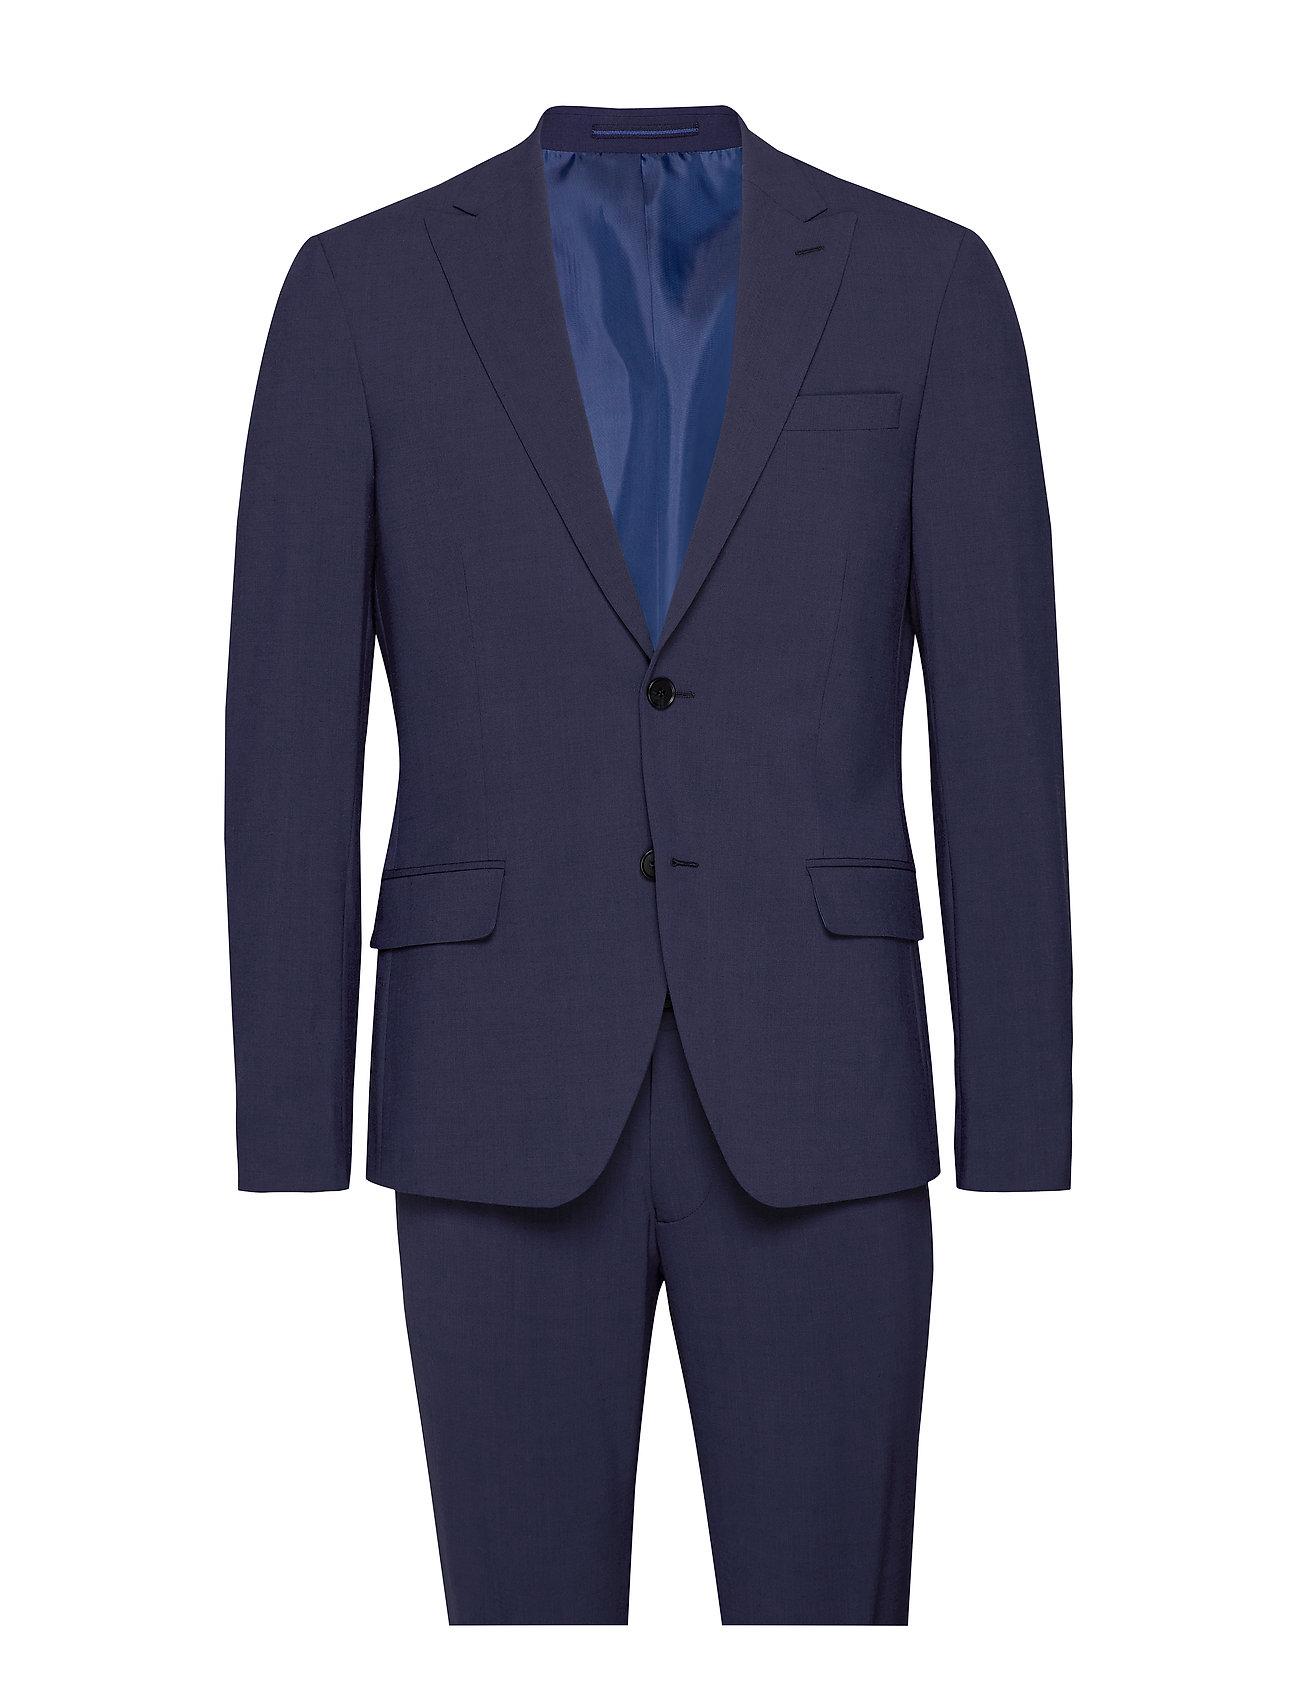 Bertoni Suit Drejer-Jepsen - 740 DRESS BLUE